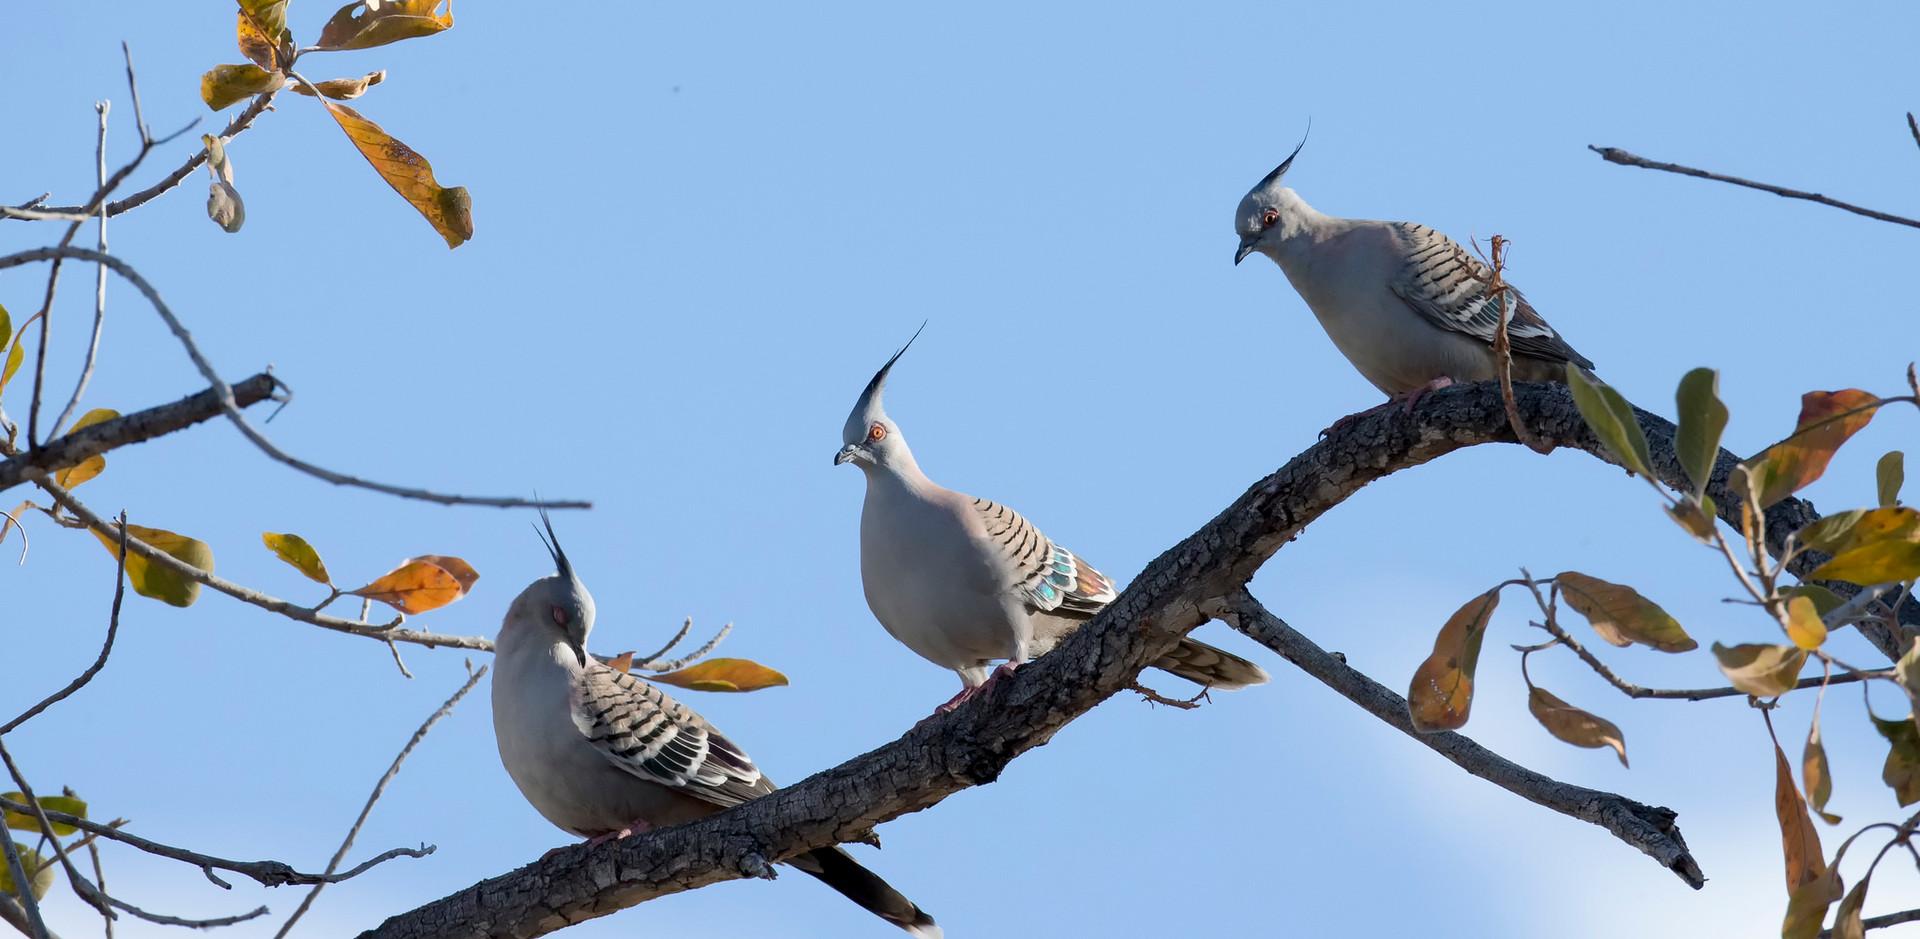 Three Crested Pigeons